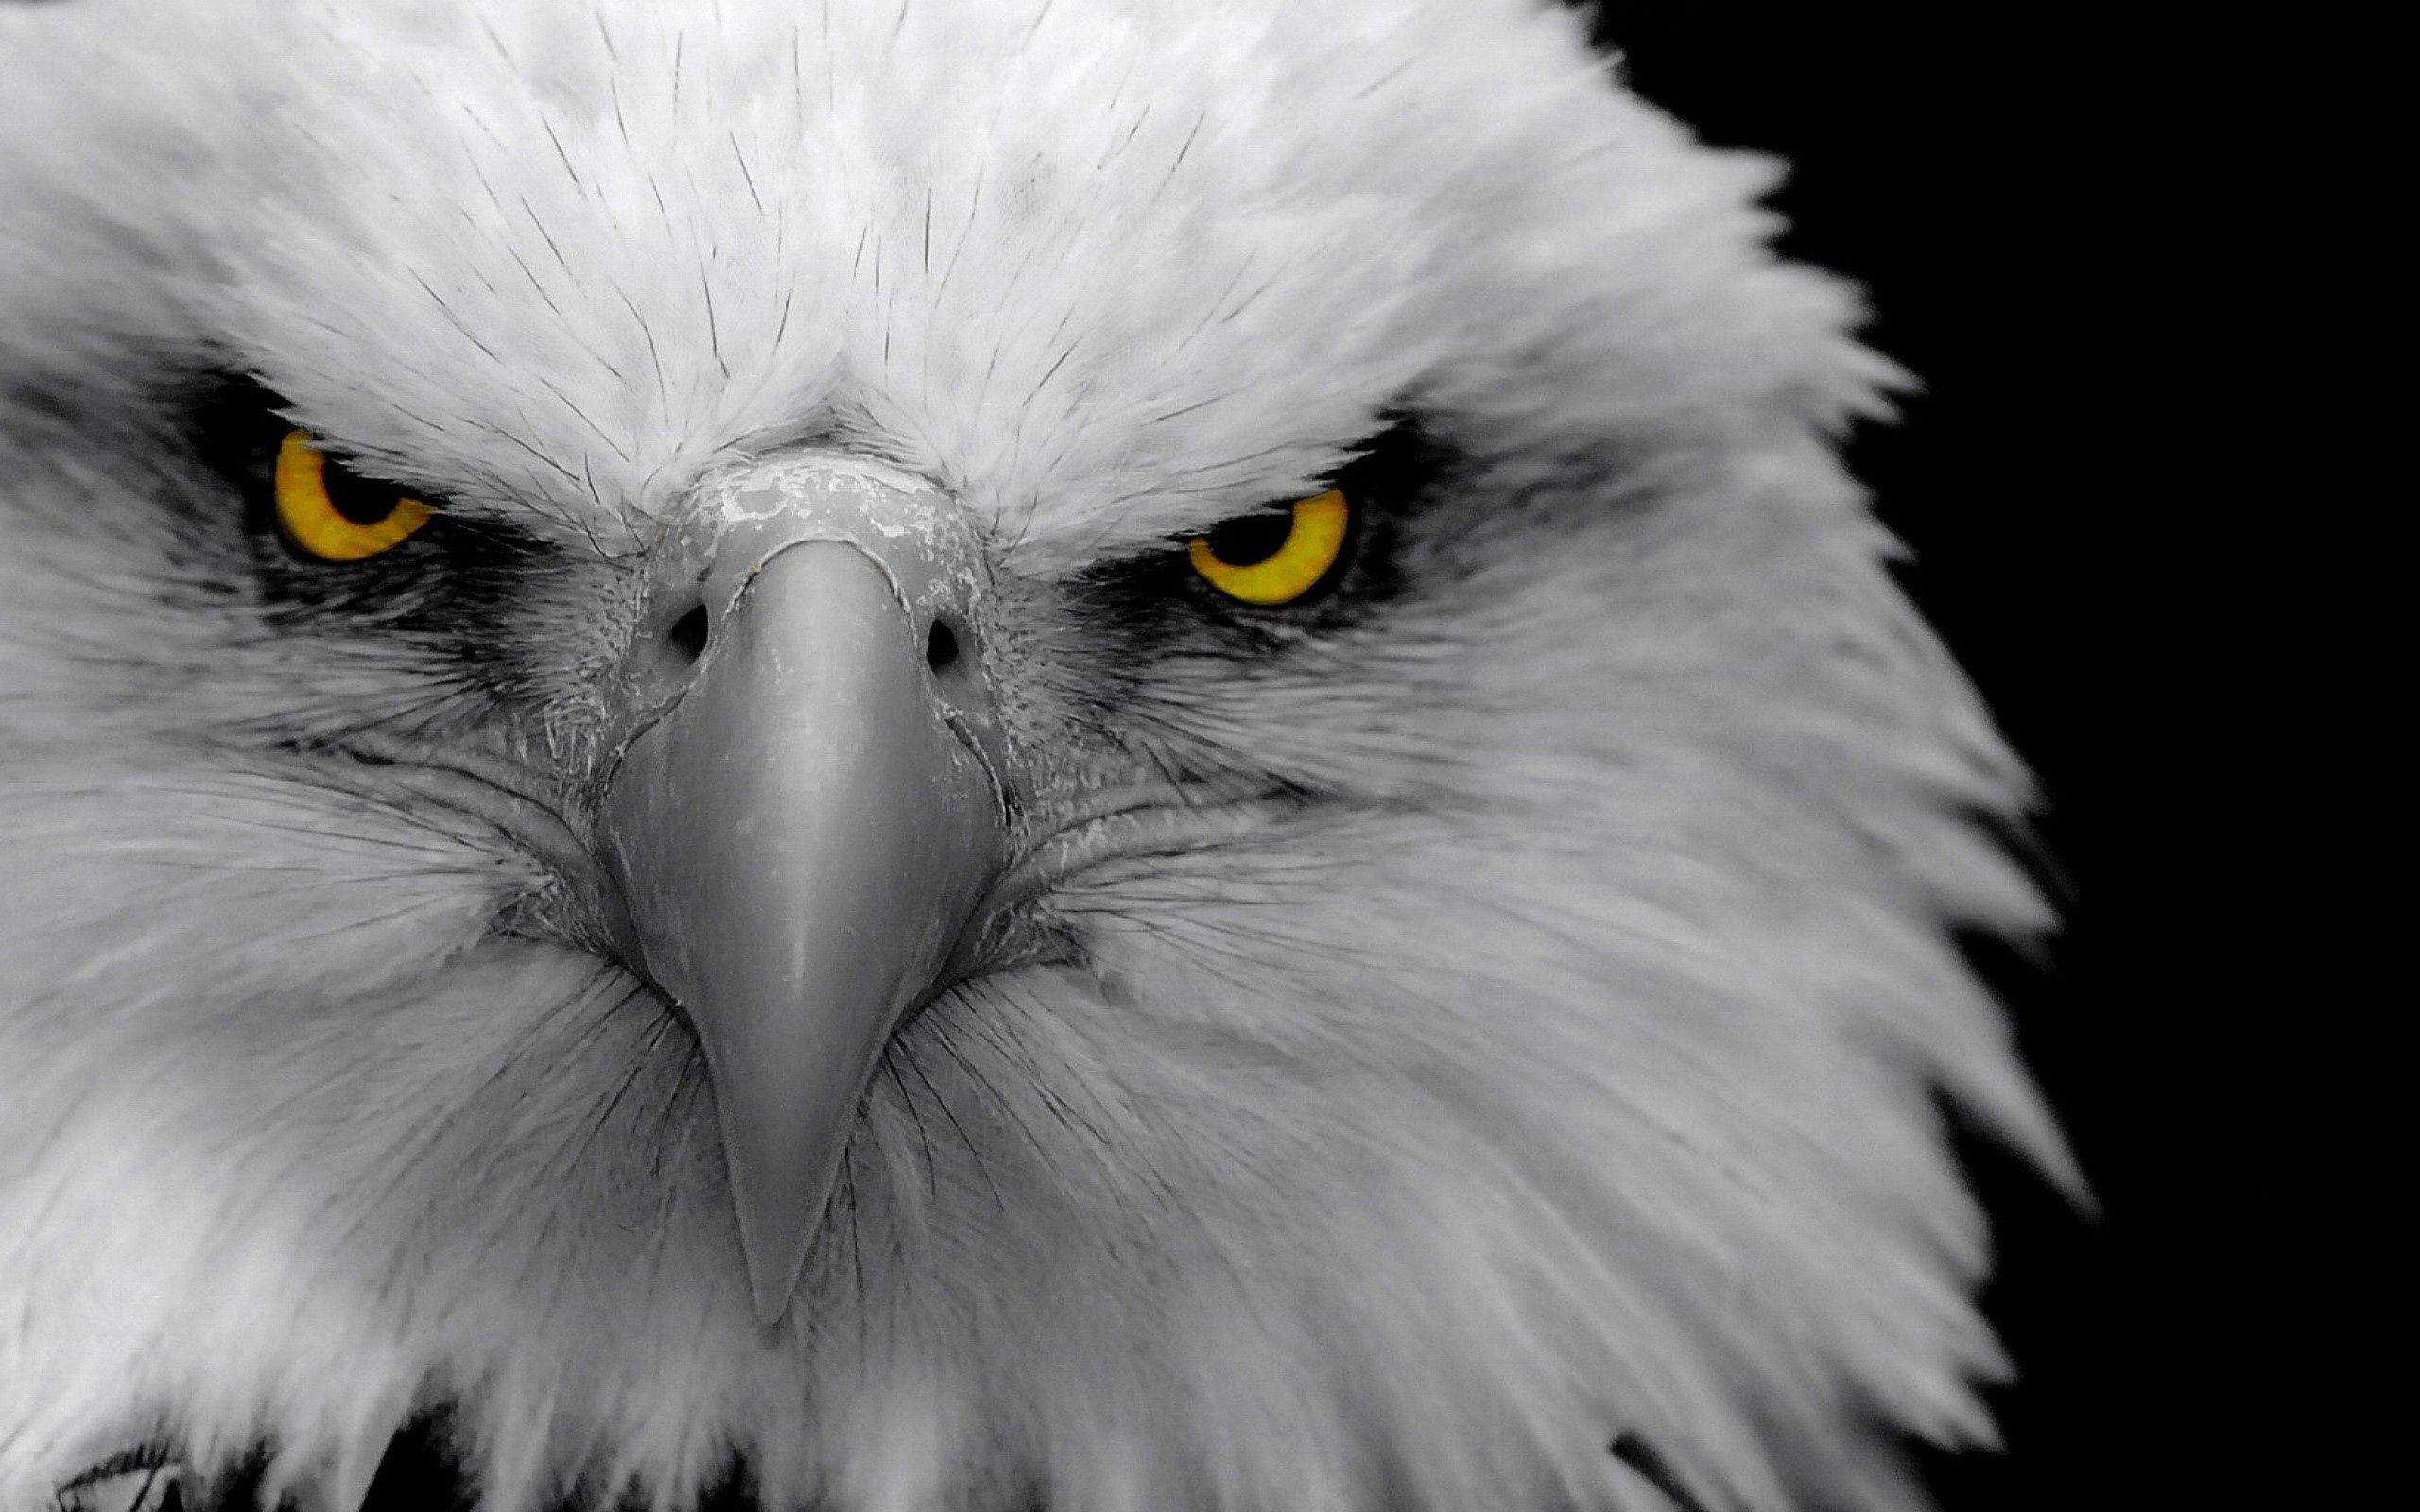 72229 descargar fondo de pantalla Animales, Águila, Pájaro, Depredador, Pico: protectores de pantalla e imágenes gratis